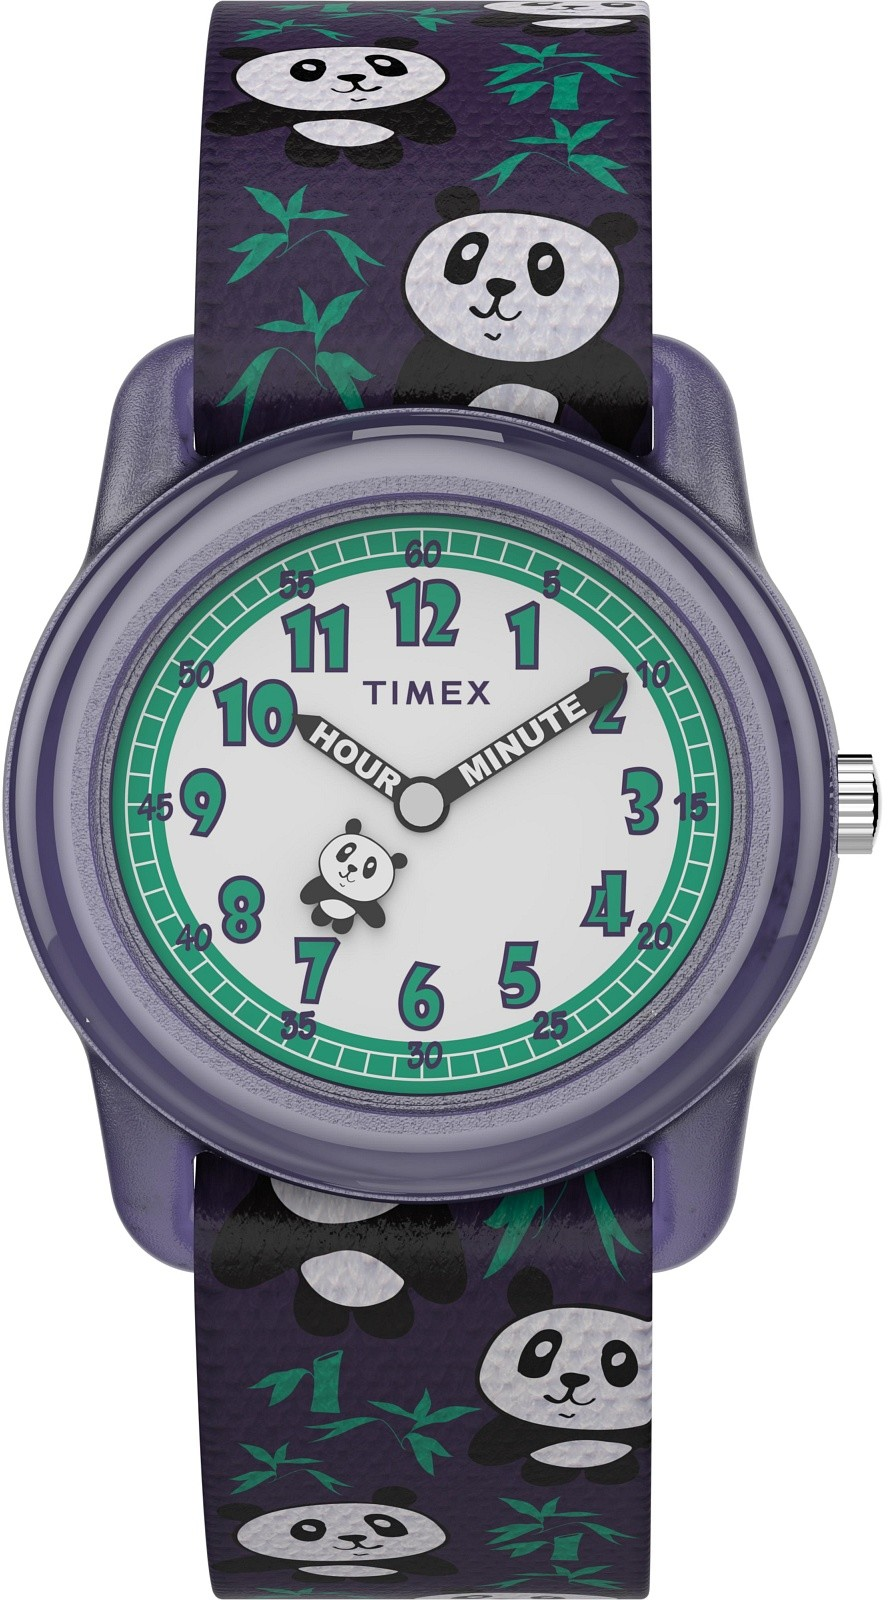 Timex TW7C77000